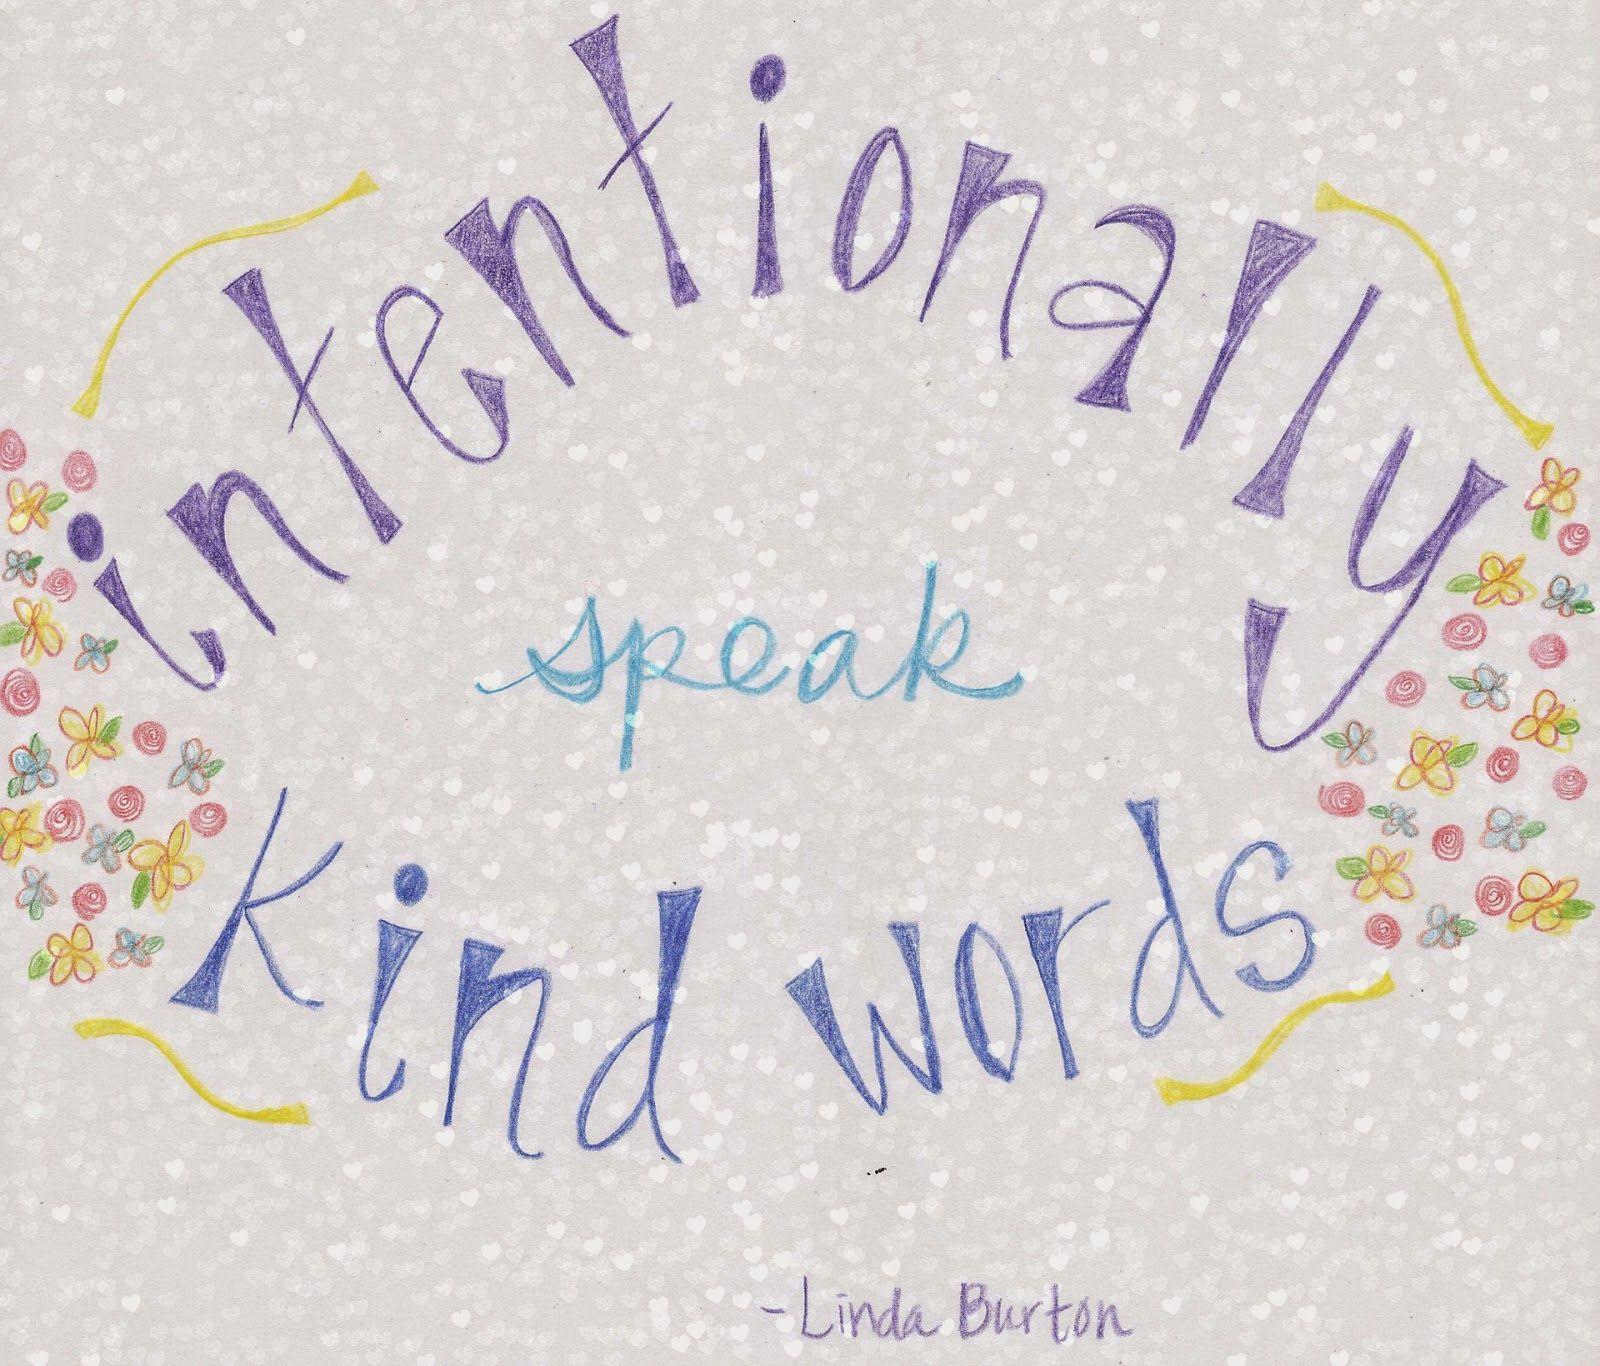 Intentionally Speak Kind Words, quote from Linda K. Burton